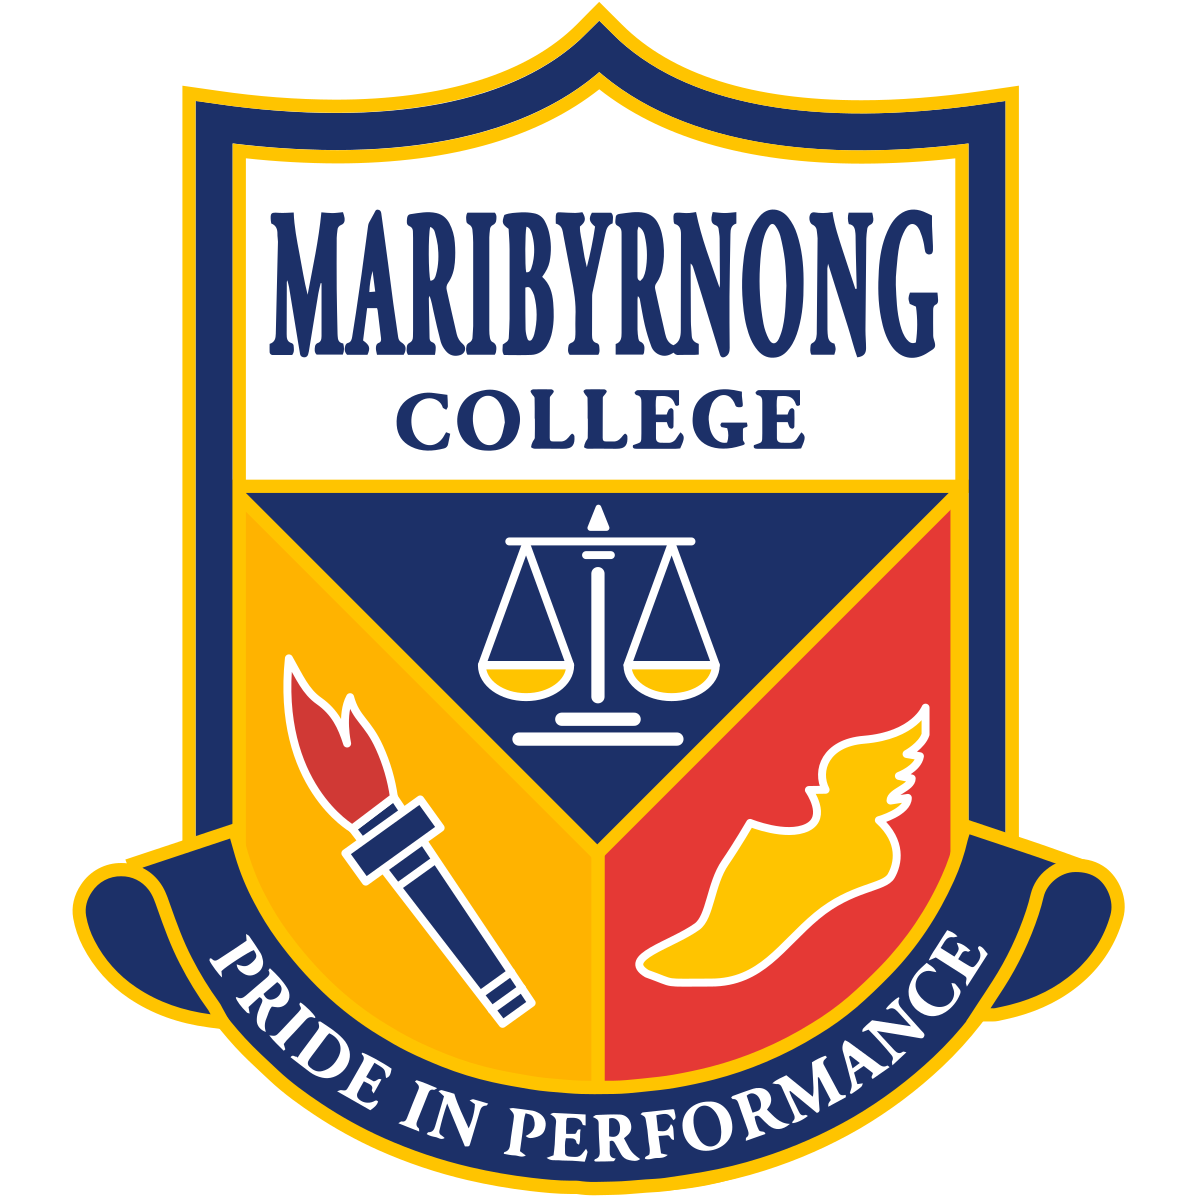 Marbibyrnong College Logo